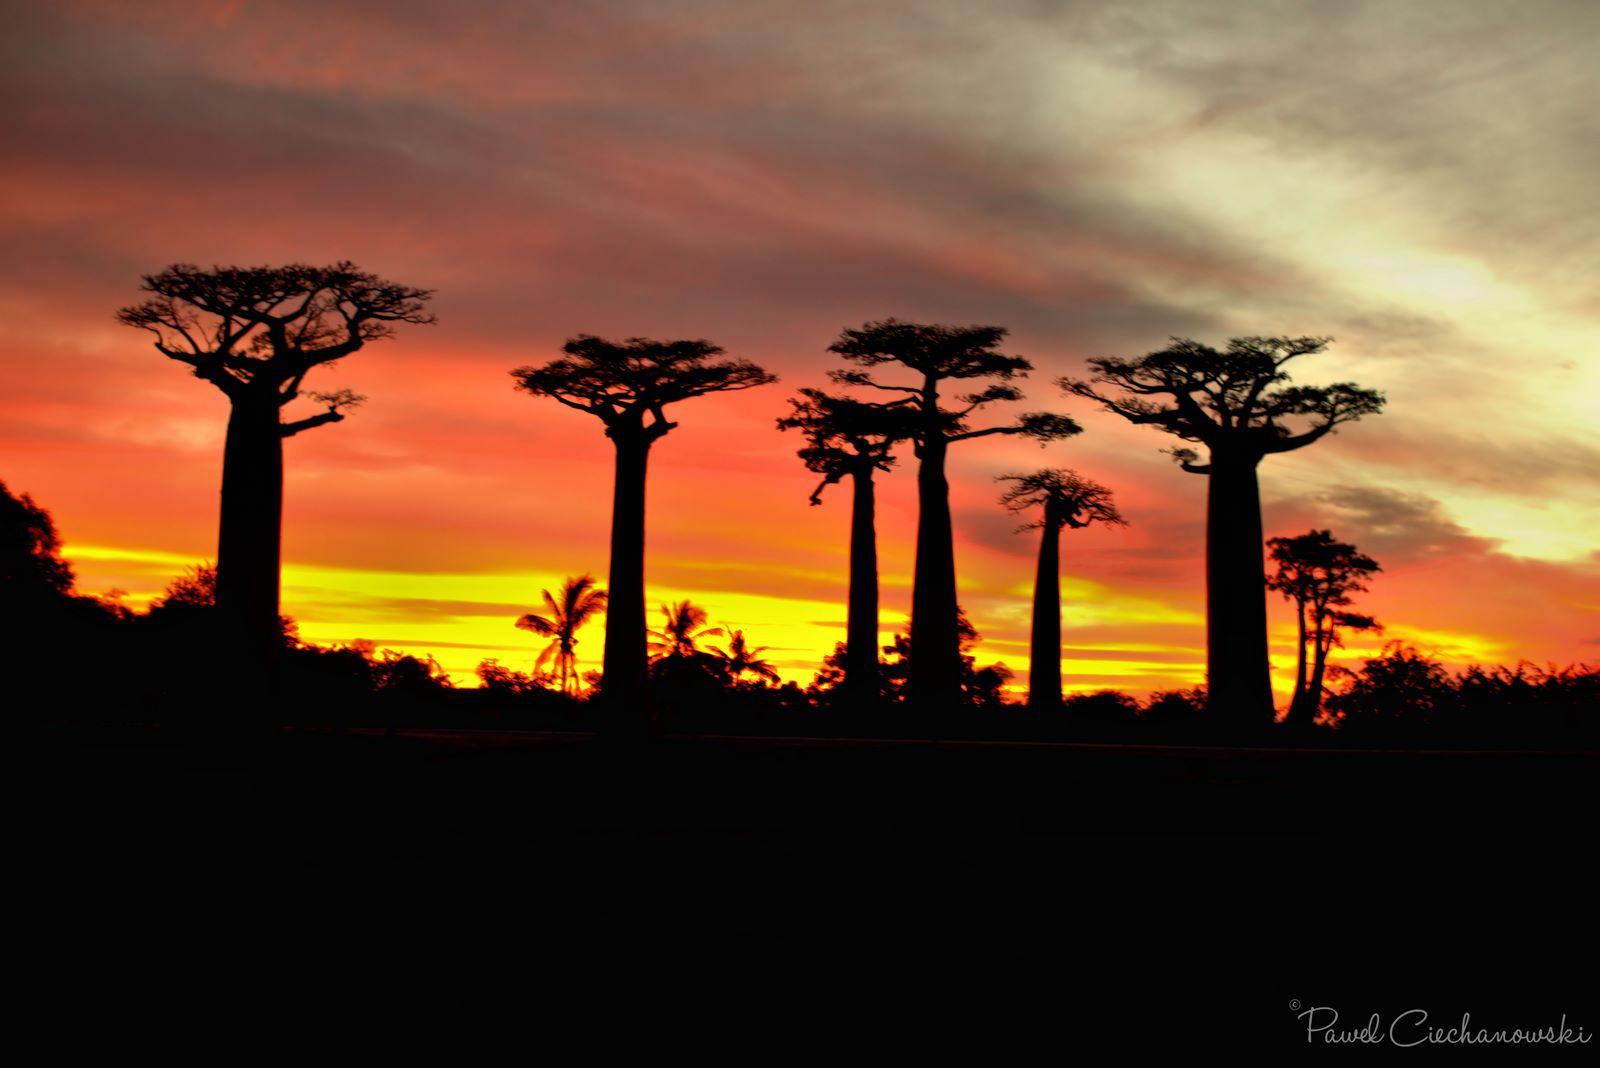 Mission Baobab Morondava – Completed